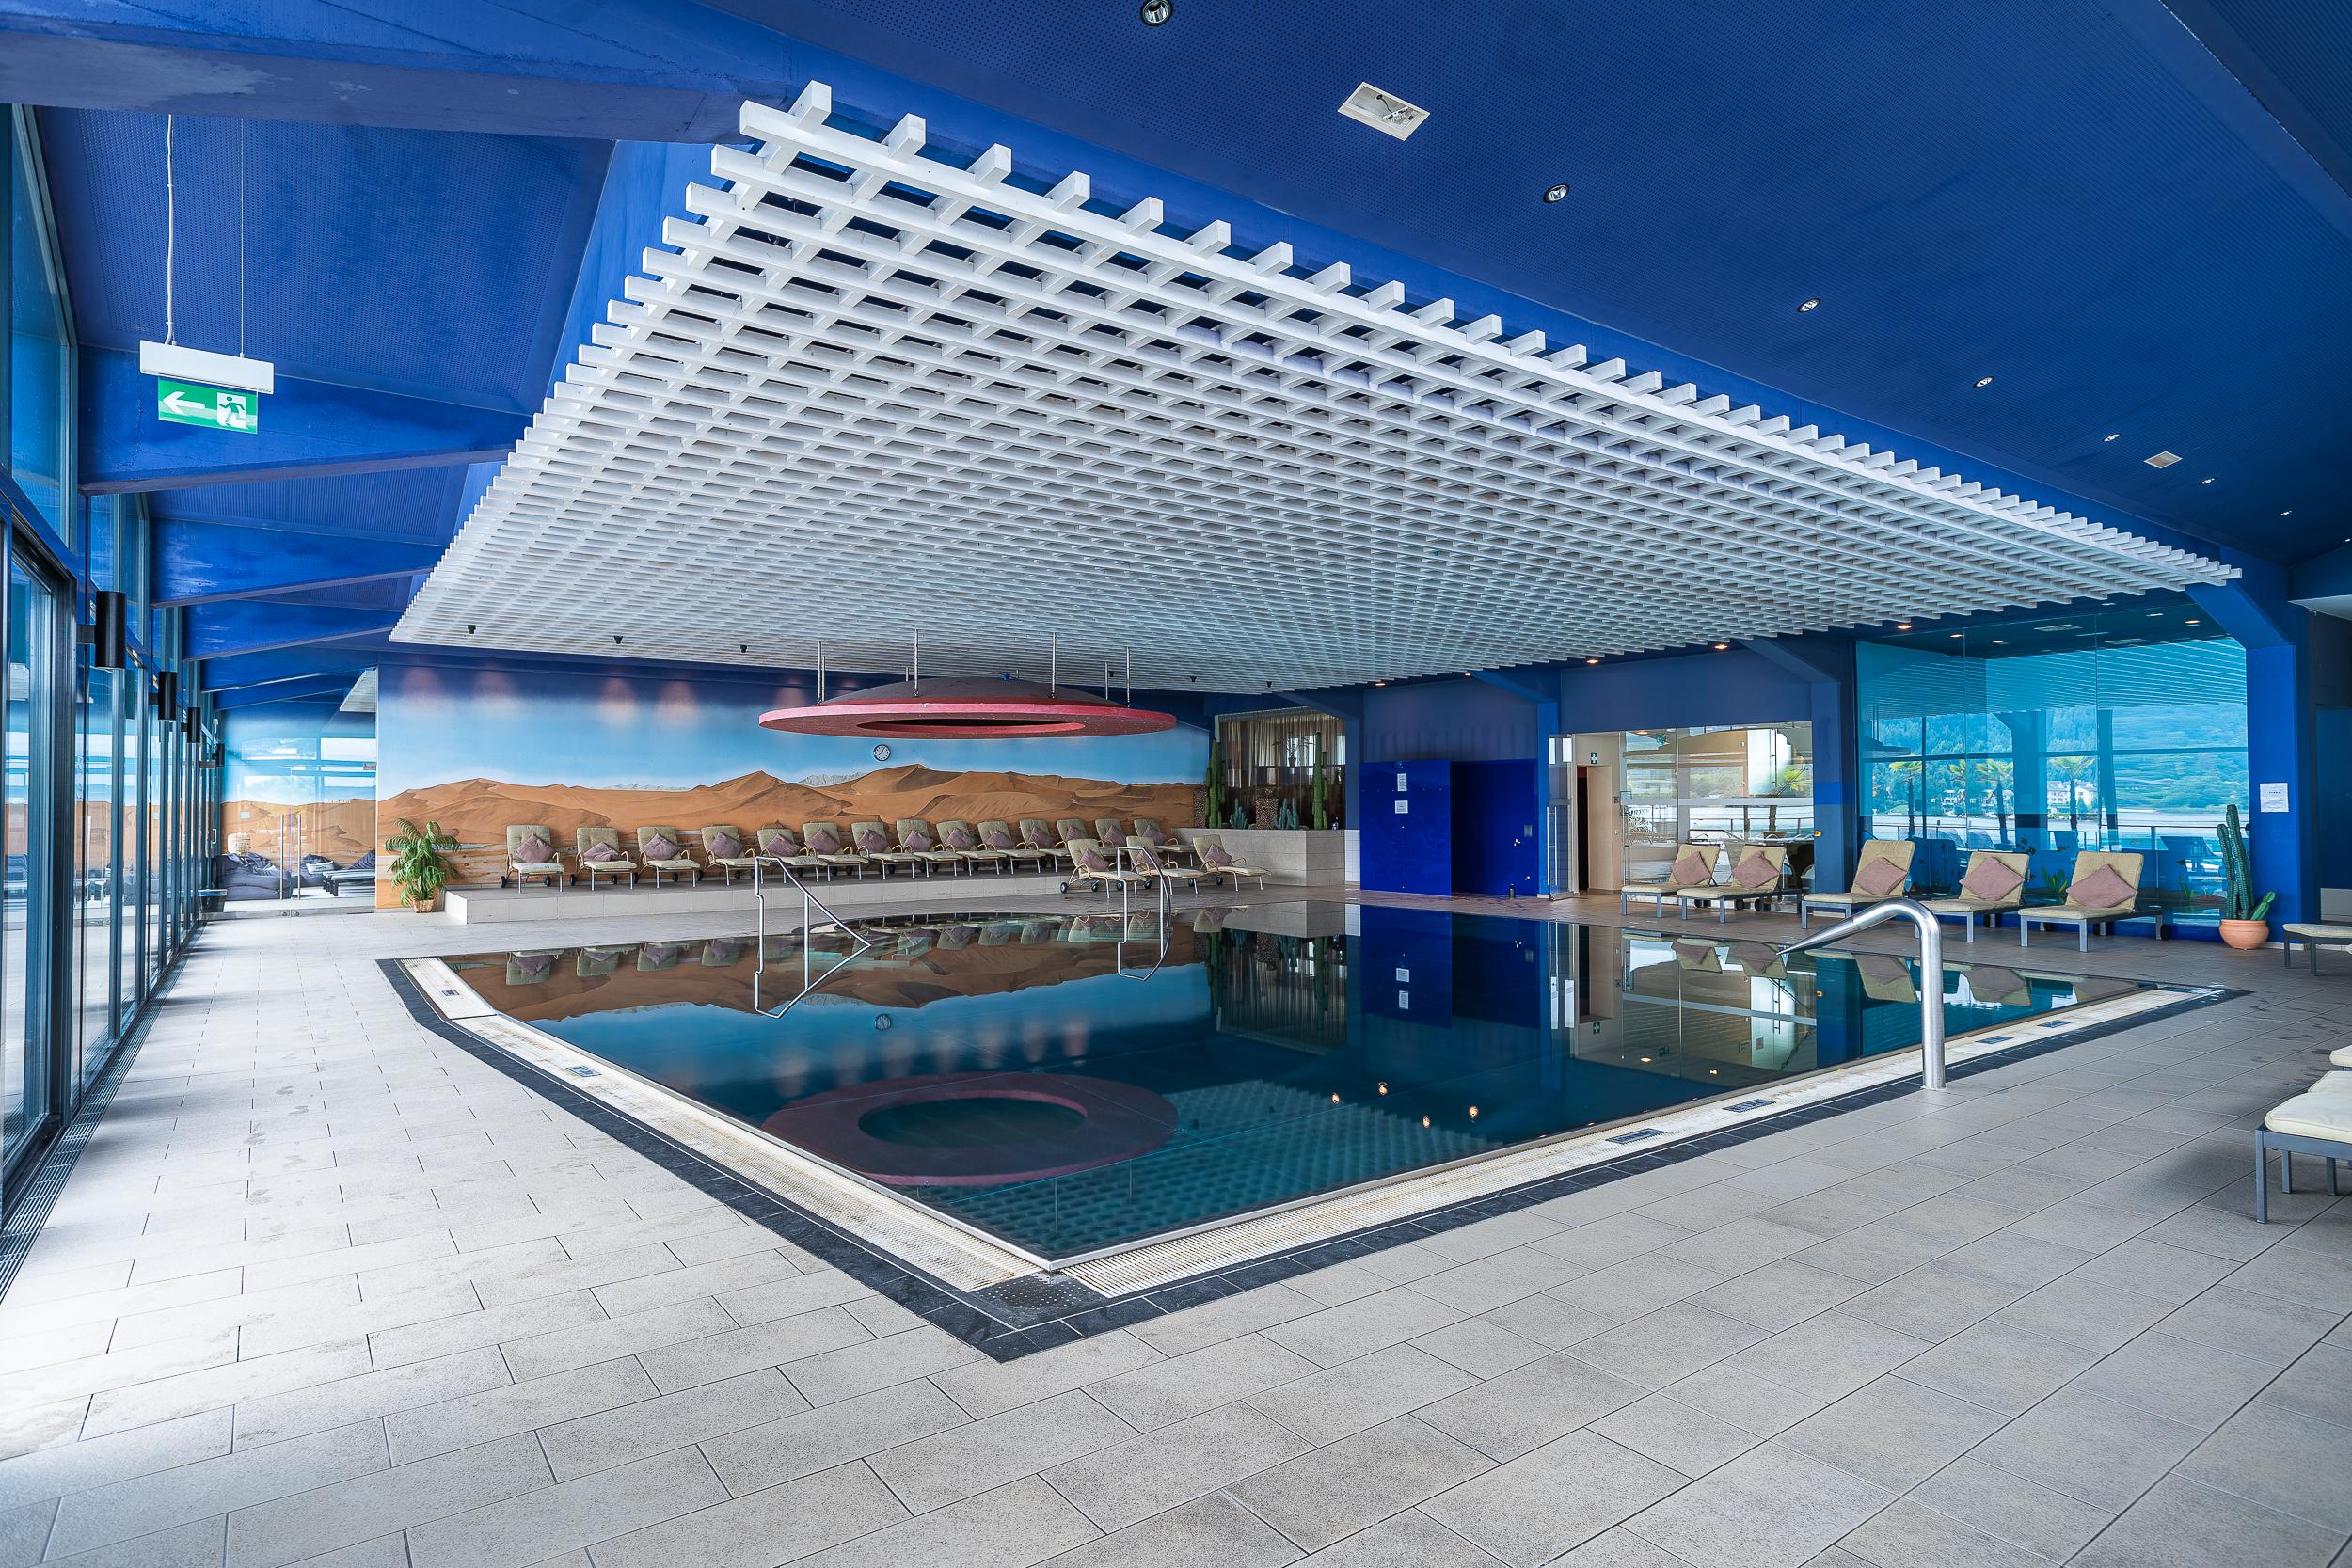 Indoor Pool Hotel Parks